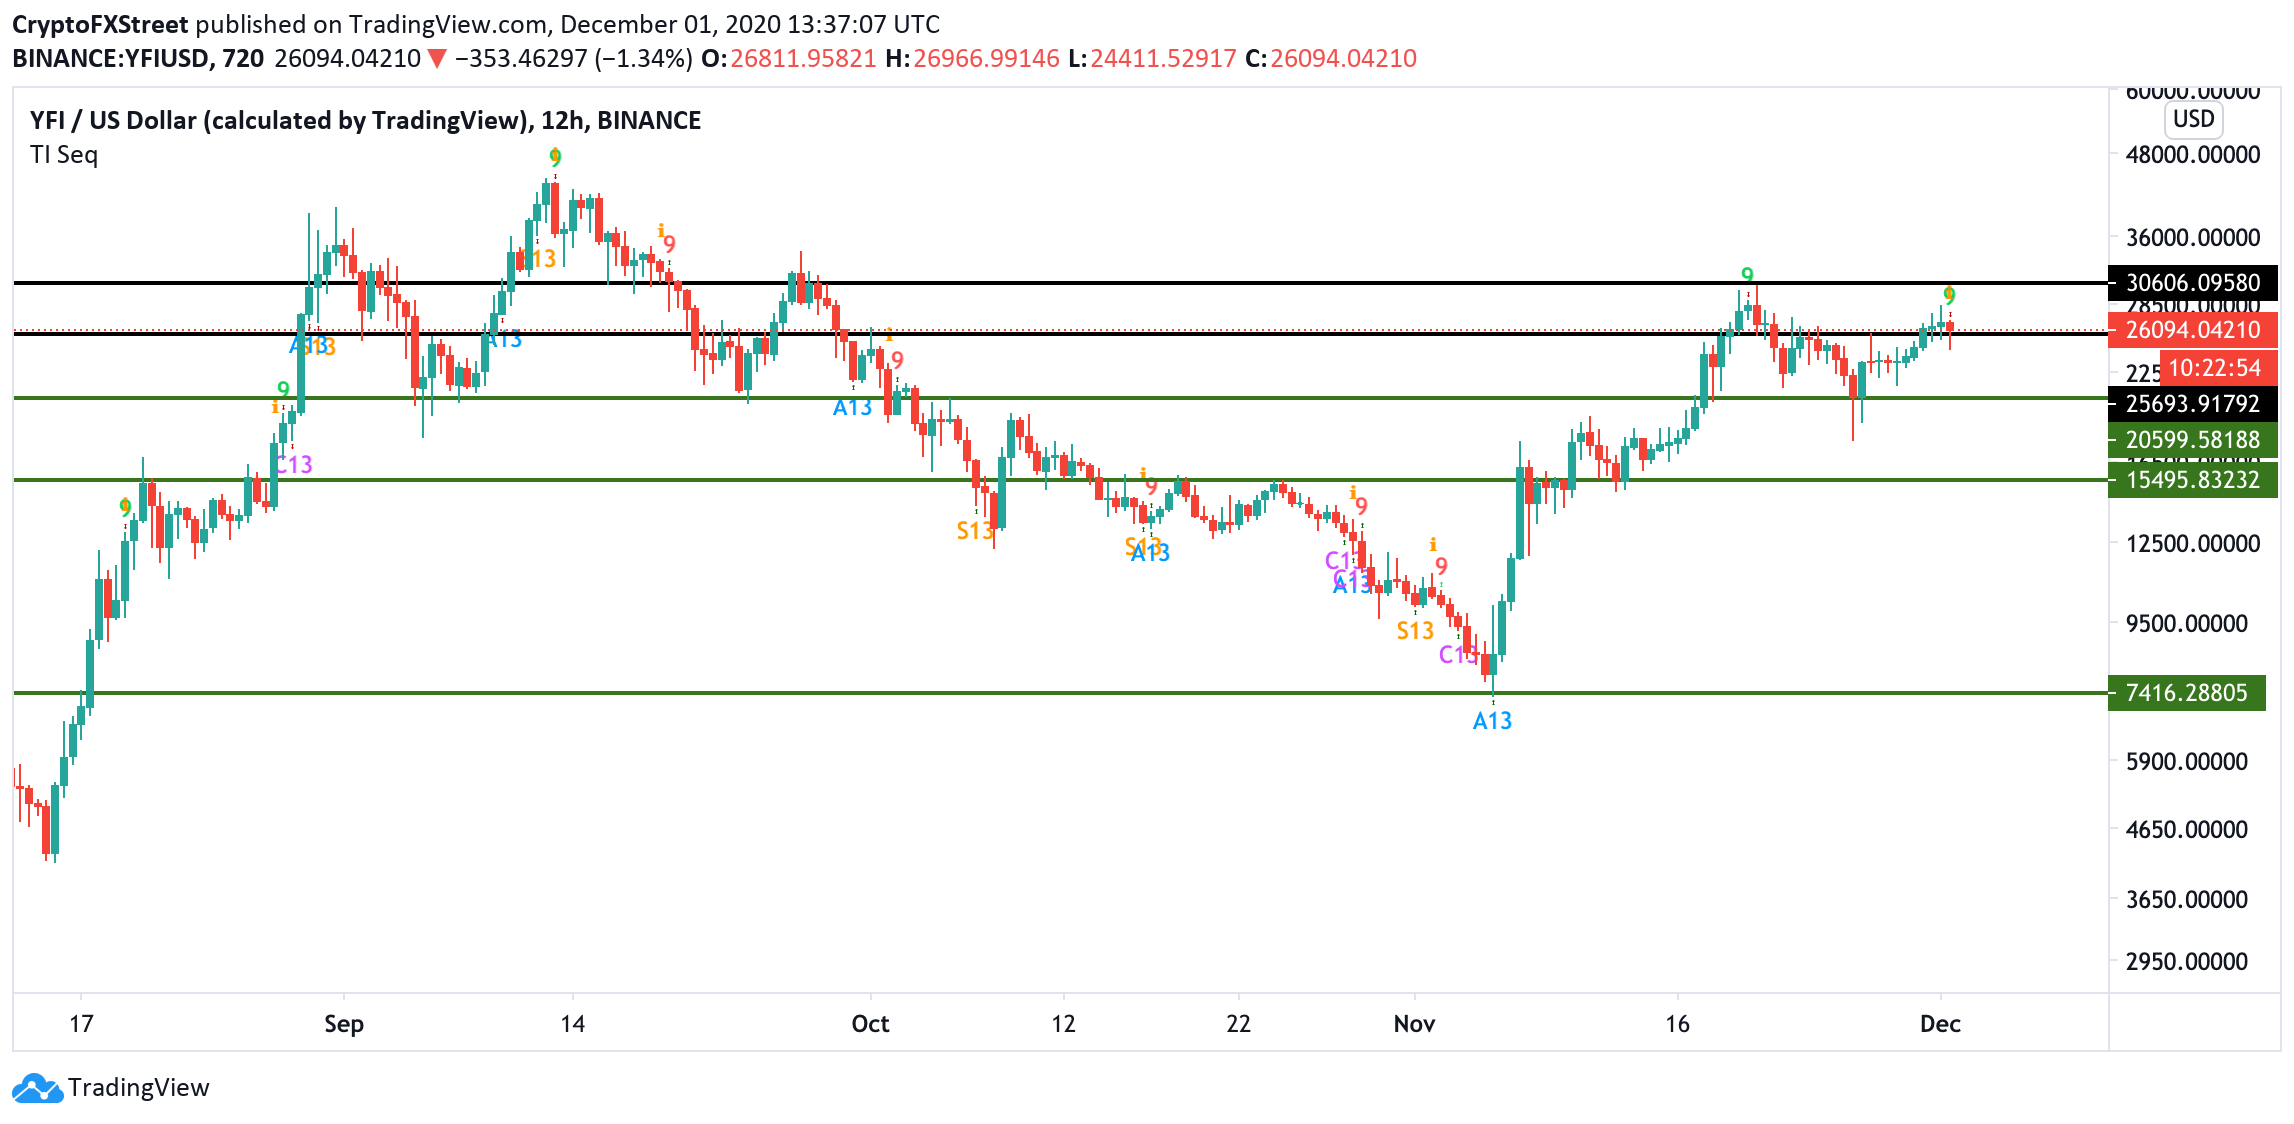 YFI/USD, 12-hour chart